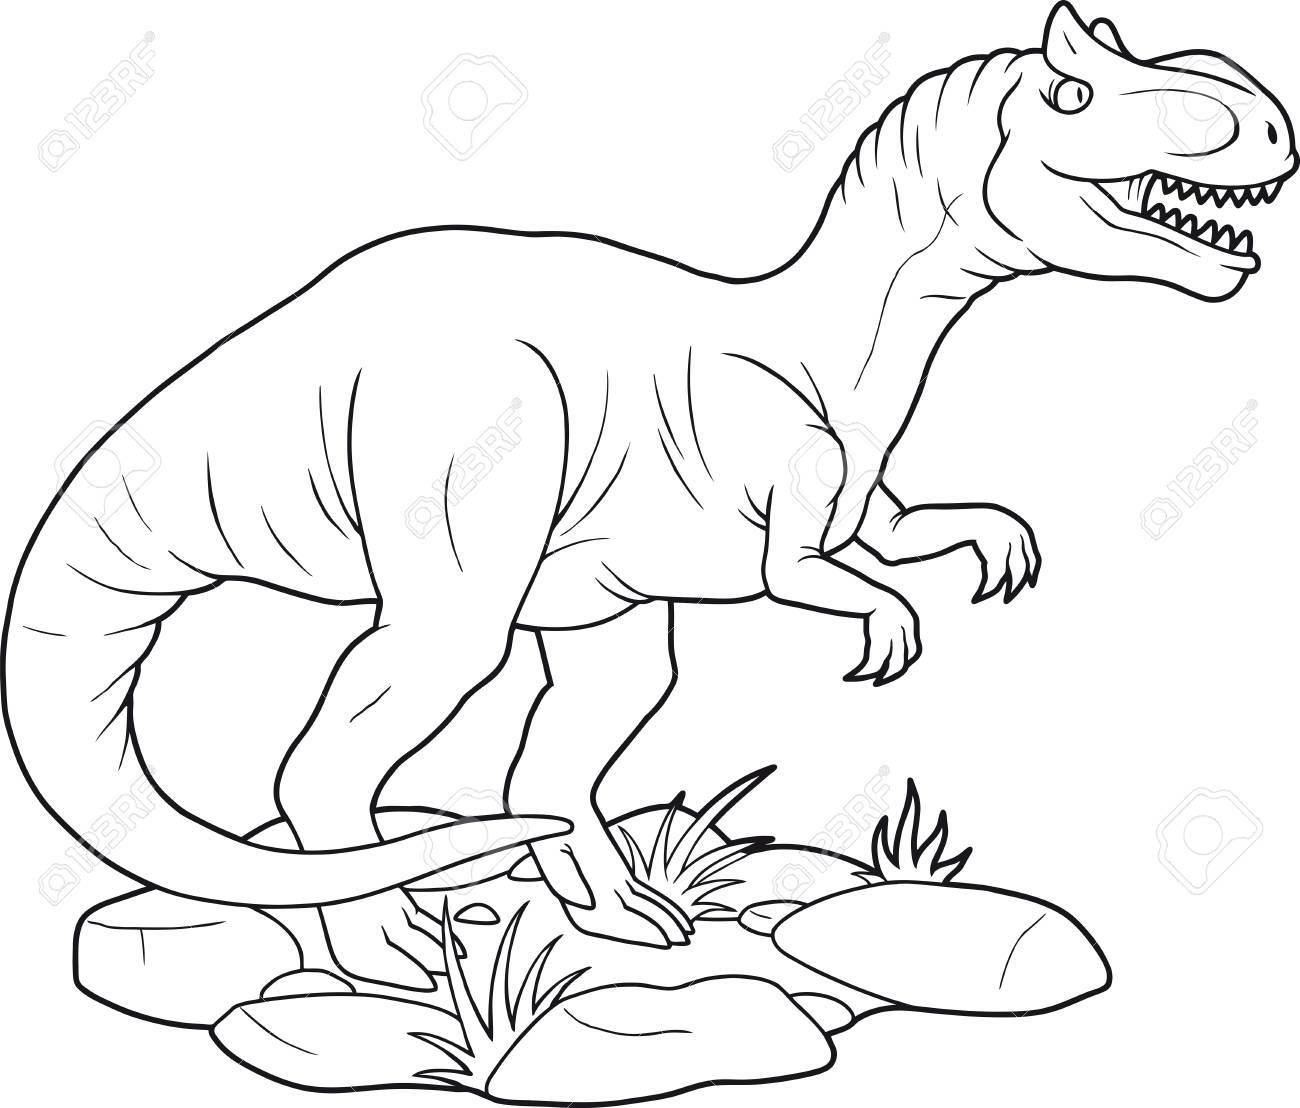 Ausmalbilder Dinosaurier Allosaurus : Allosaurus Drawing At Getdrawings Com Free For Personal Use